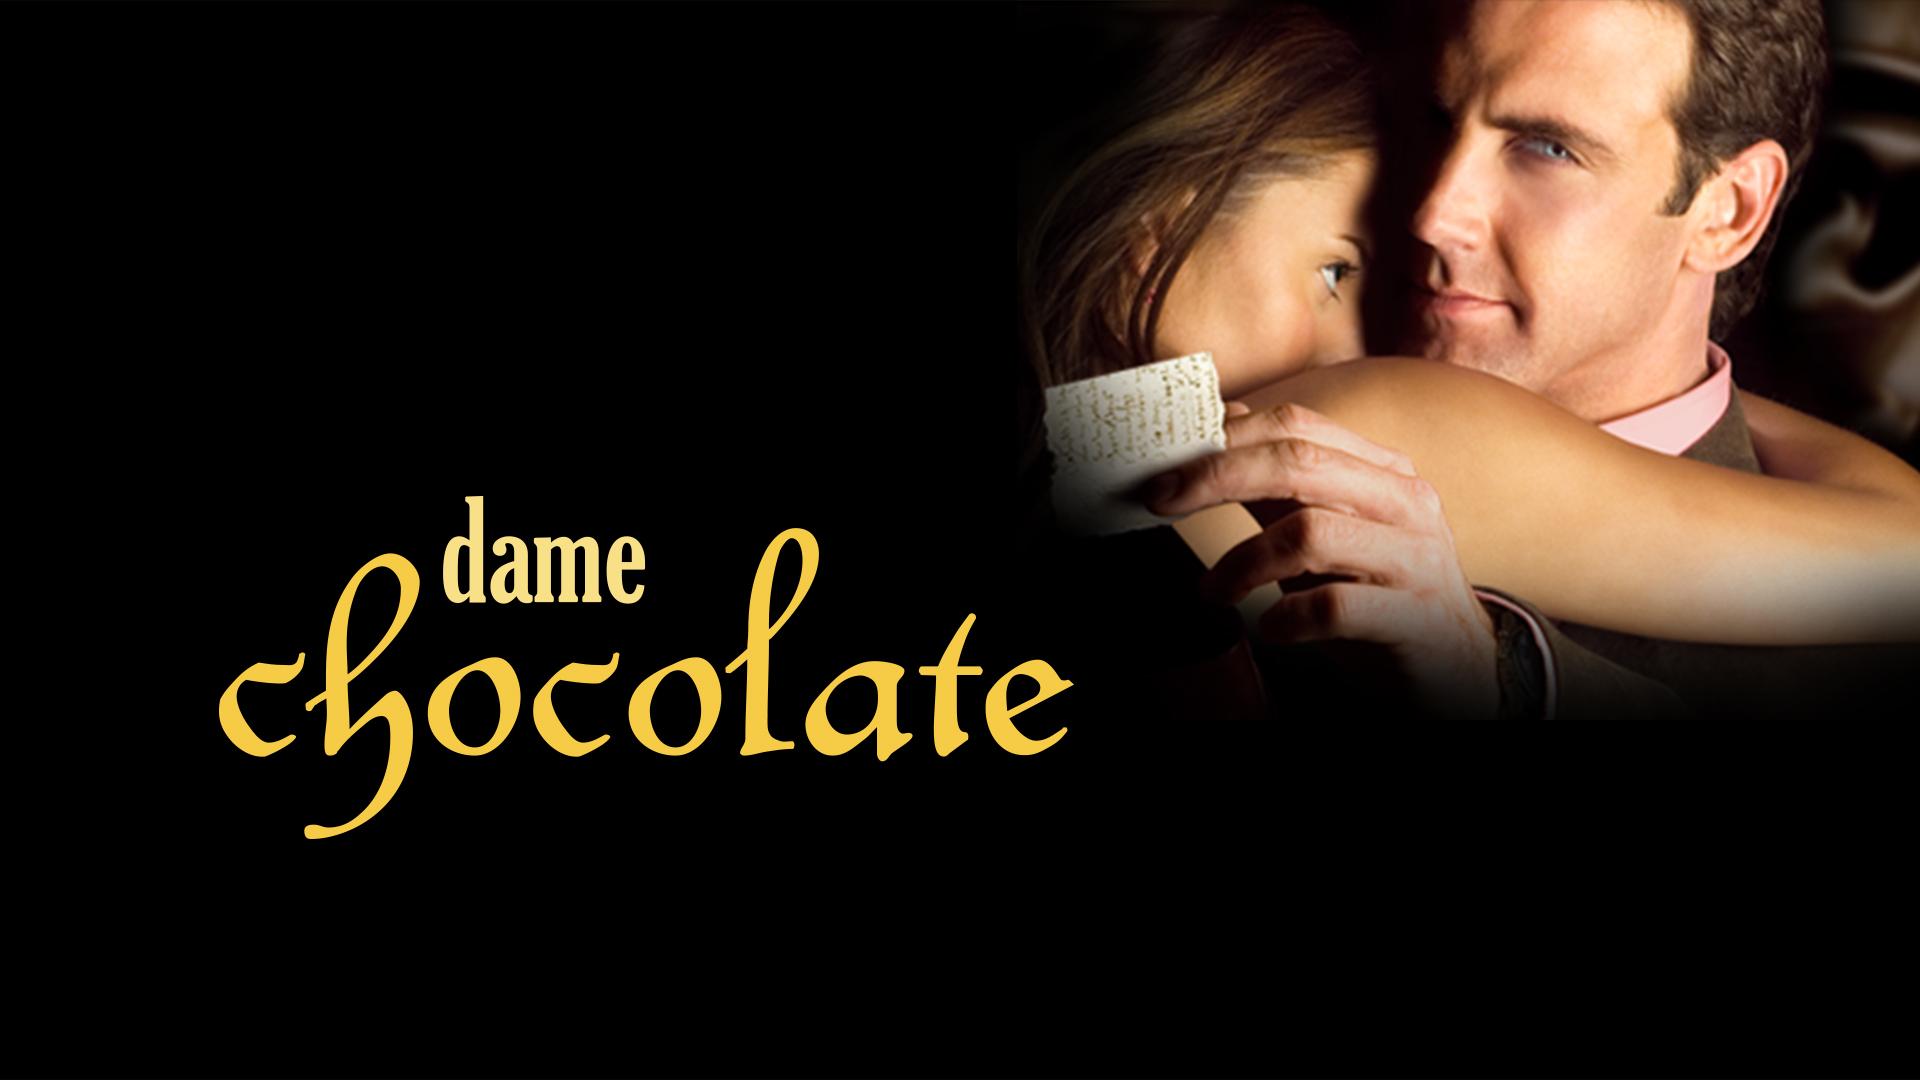 dame chocolate film in english